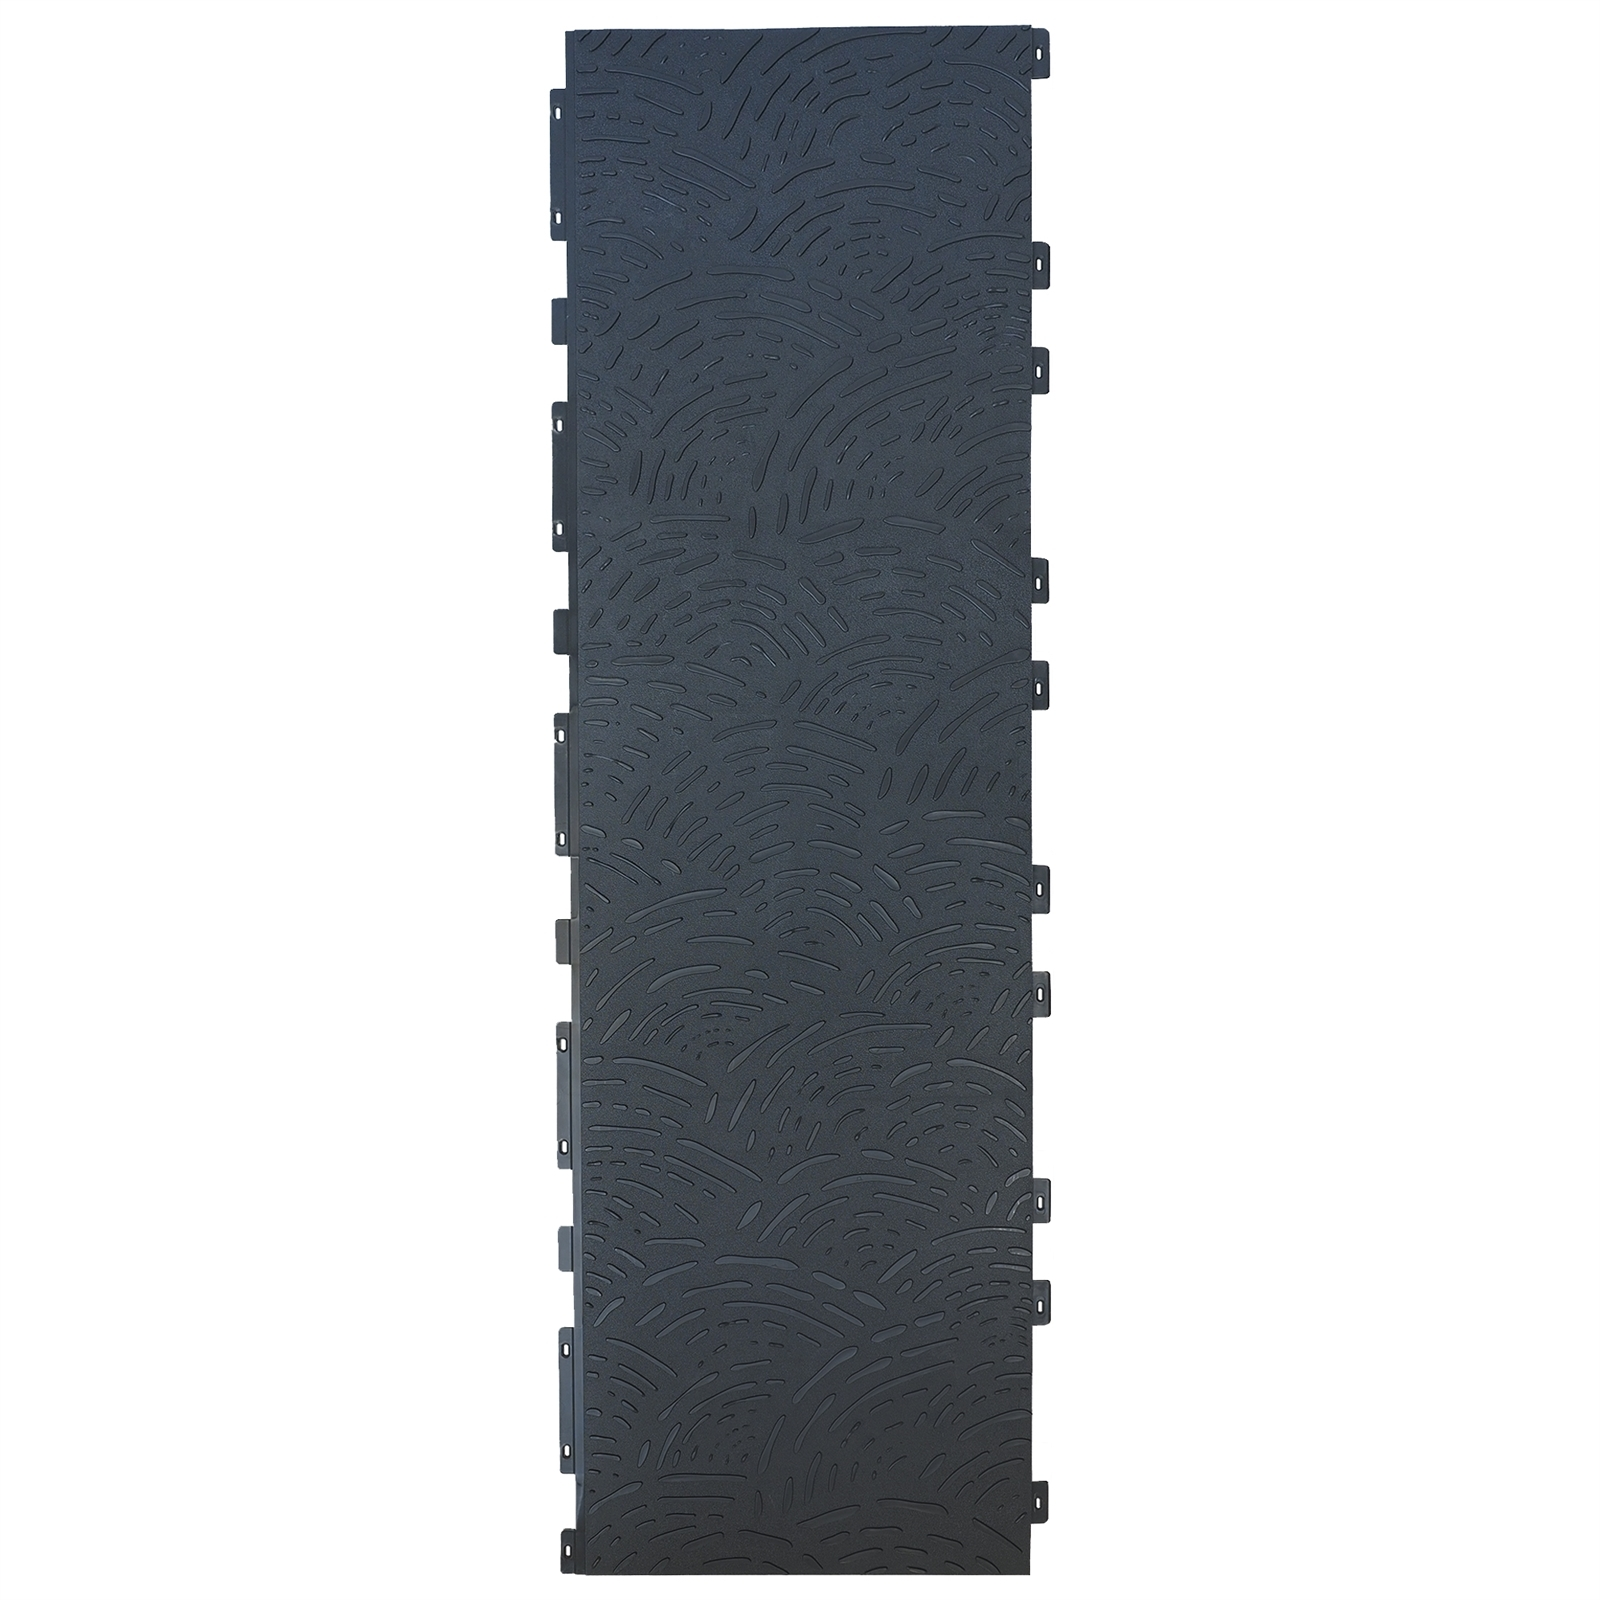 Matrix 1820 x 535mm Slate Grey Render Screen Panel